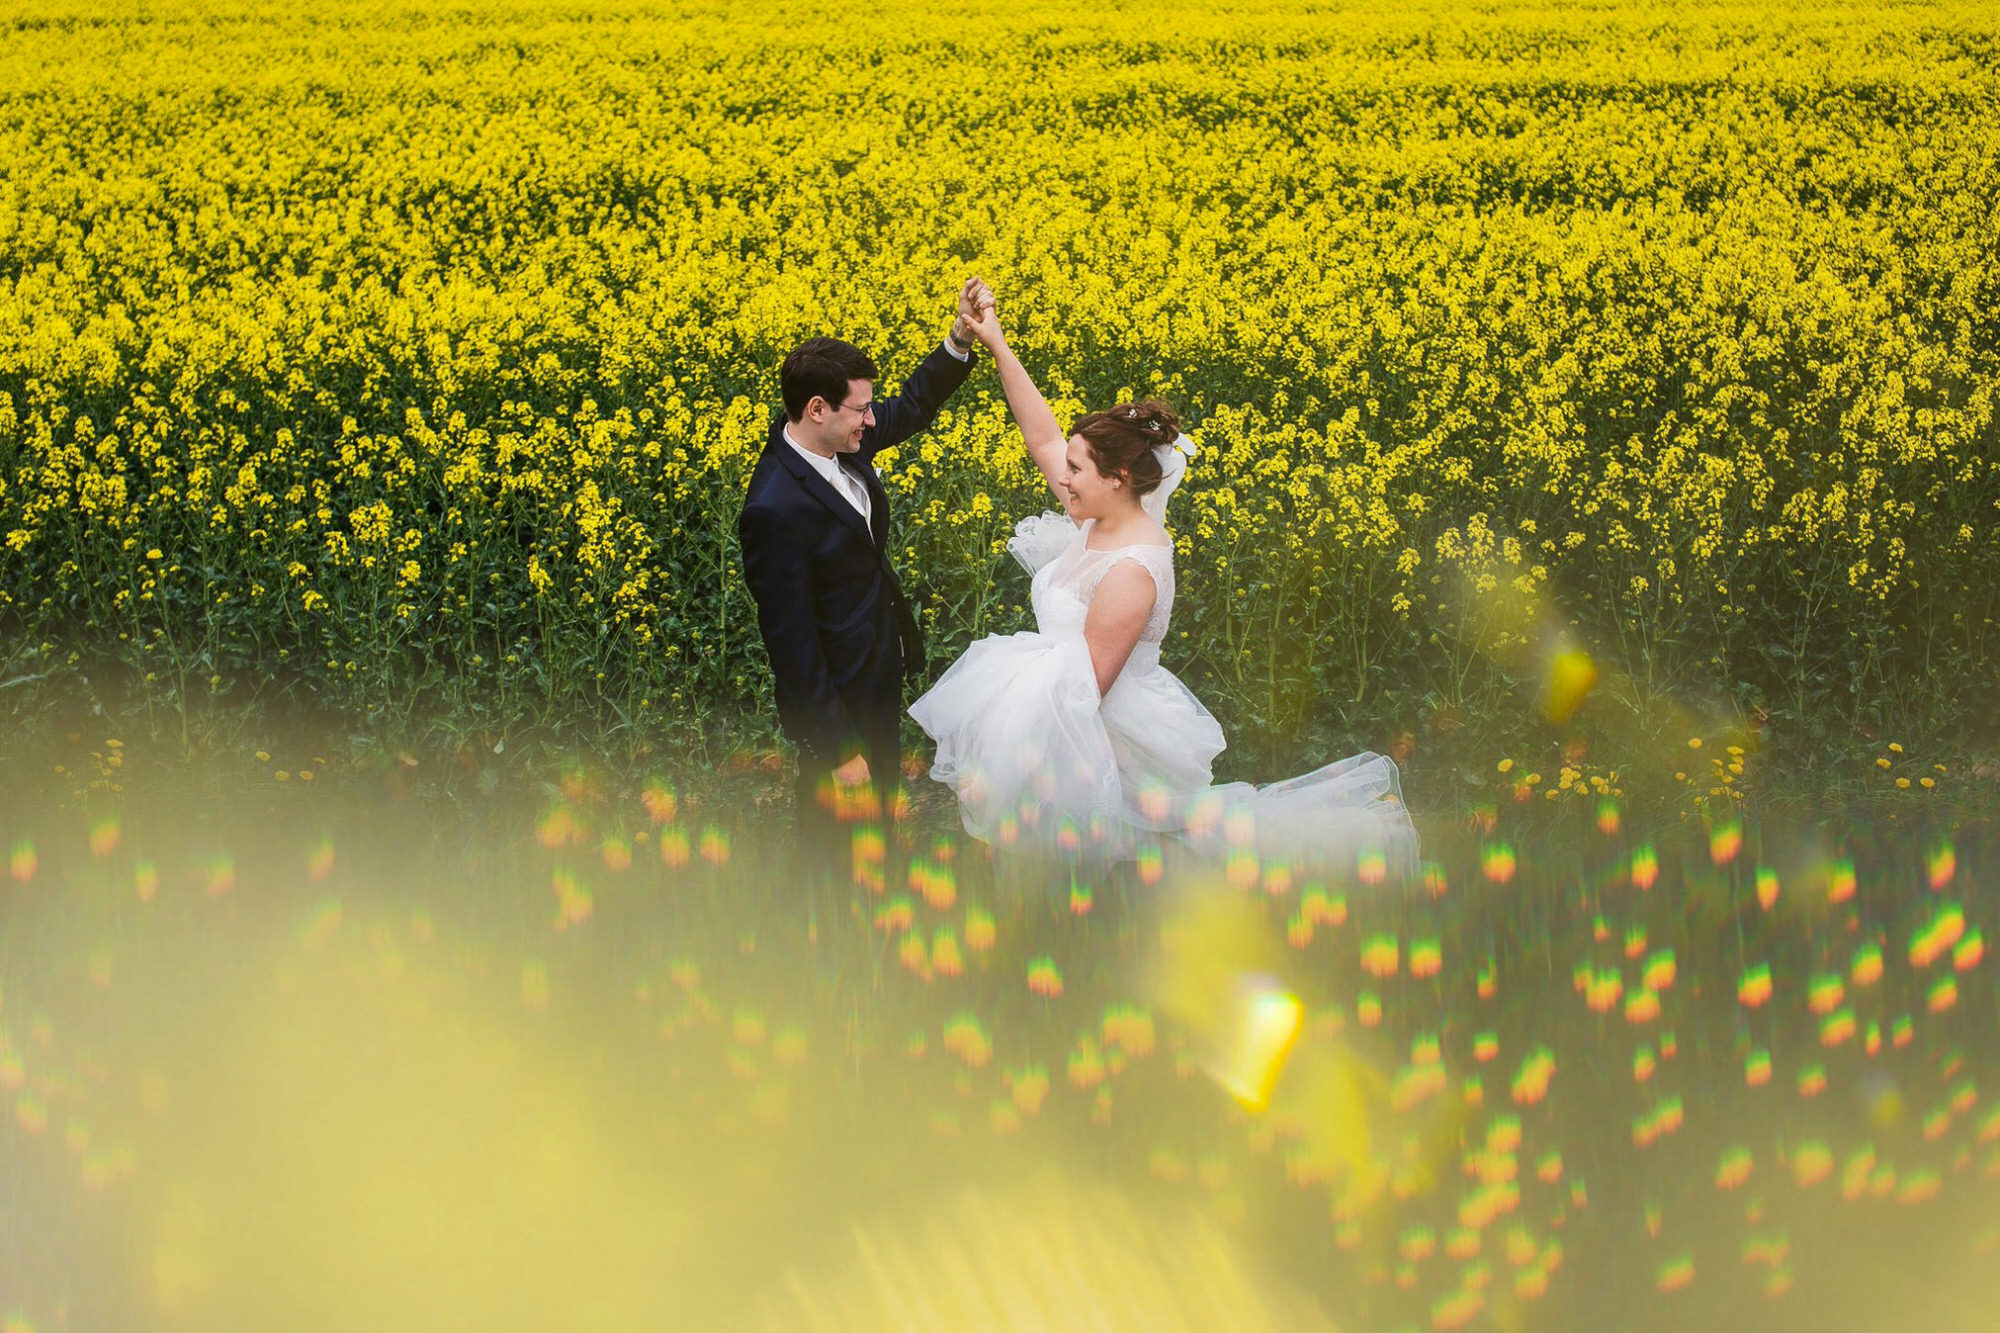 fotos de casamento na primavera